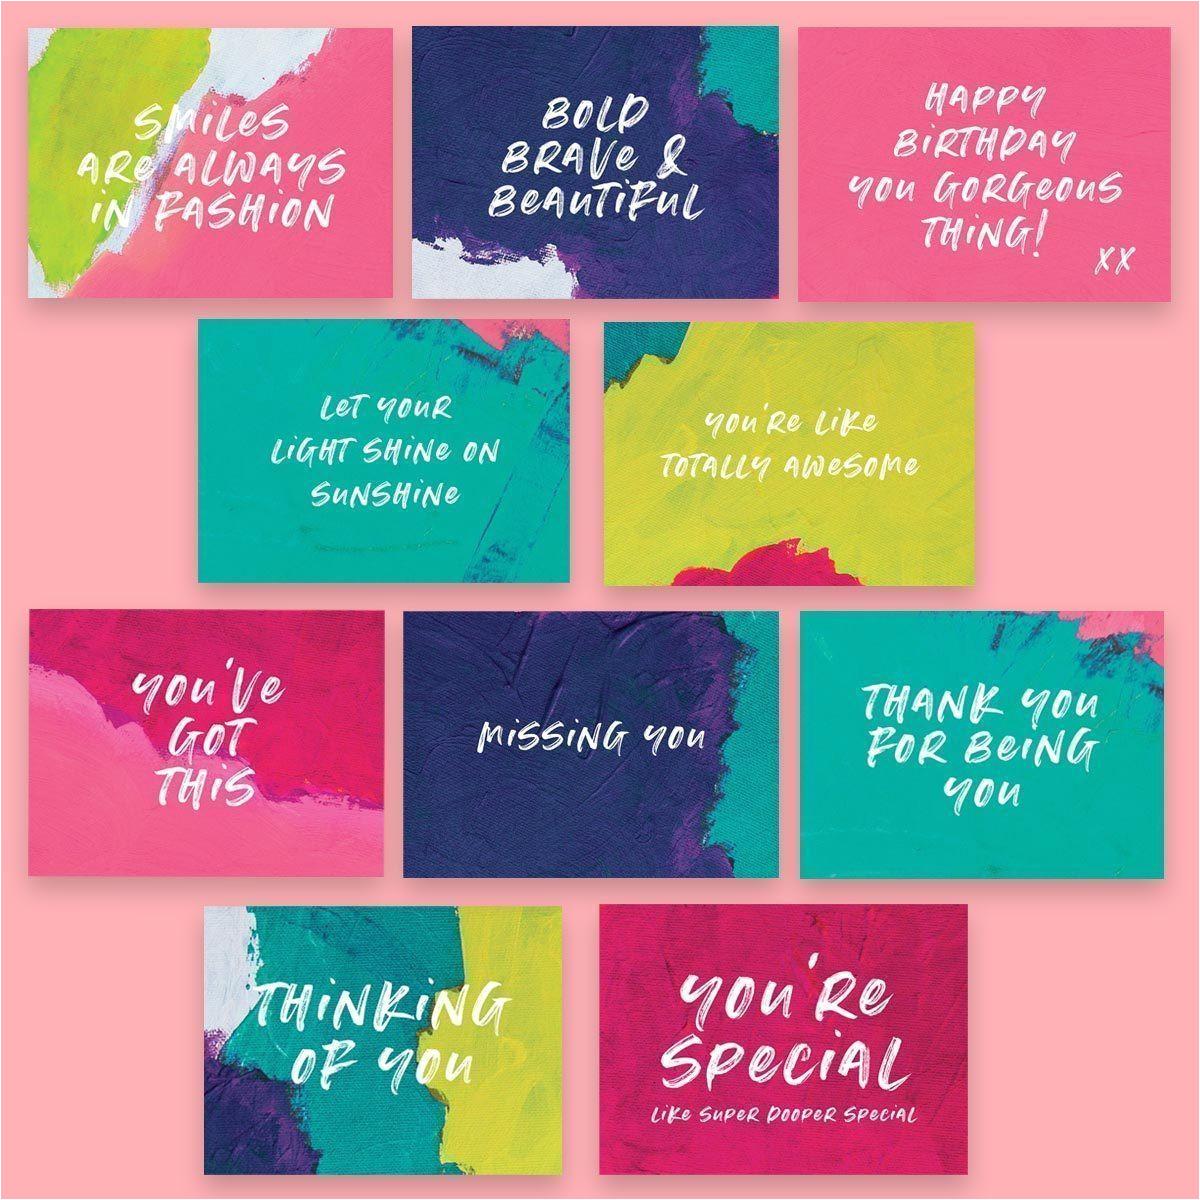 all greeting cards 865df311 9ca9 402e bc4c 926896630a8d 1200x jpg